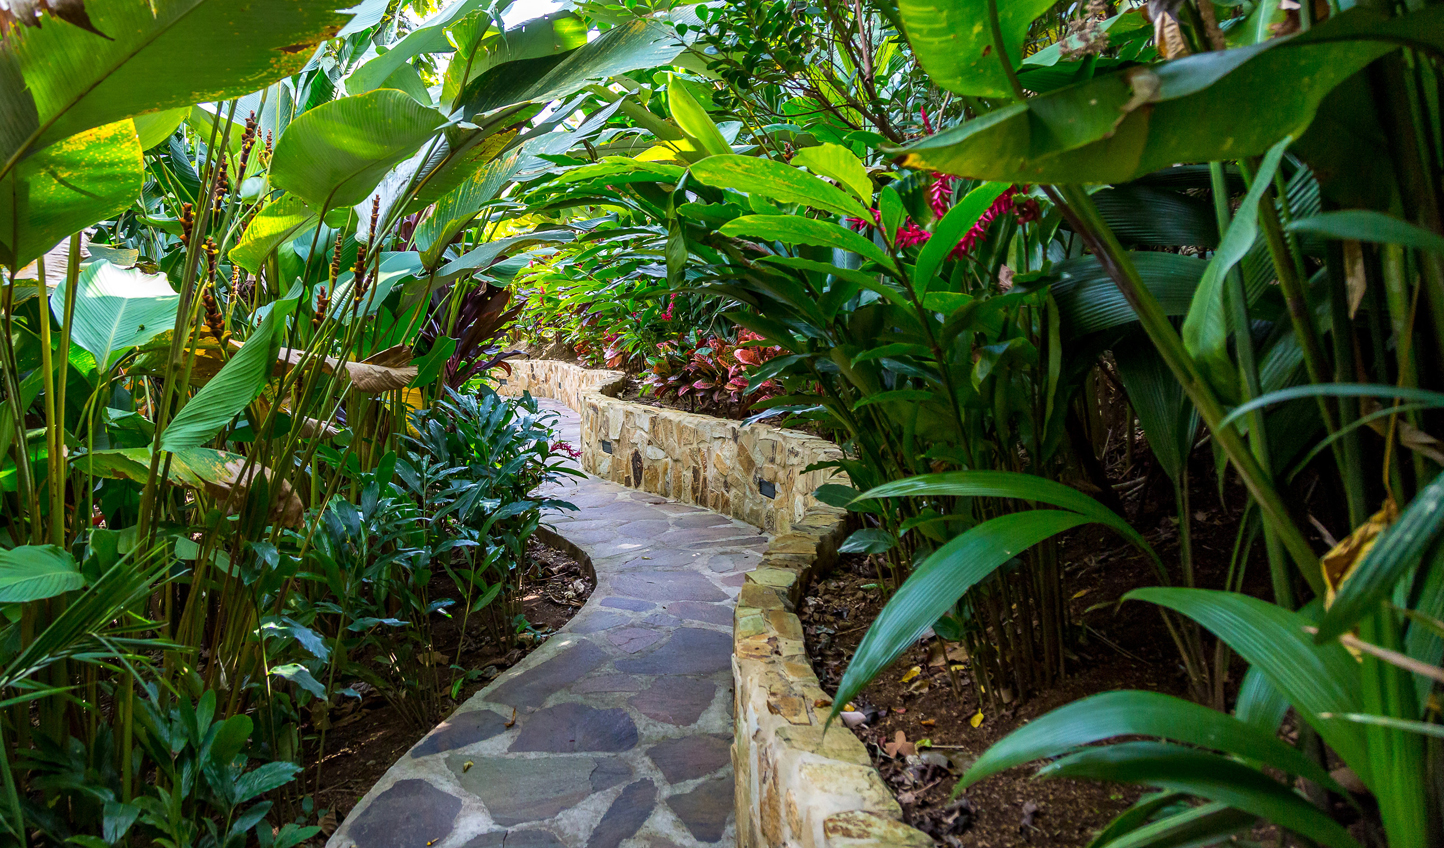 Stroll through the jungle gardens